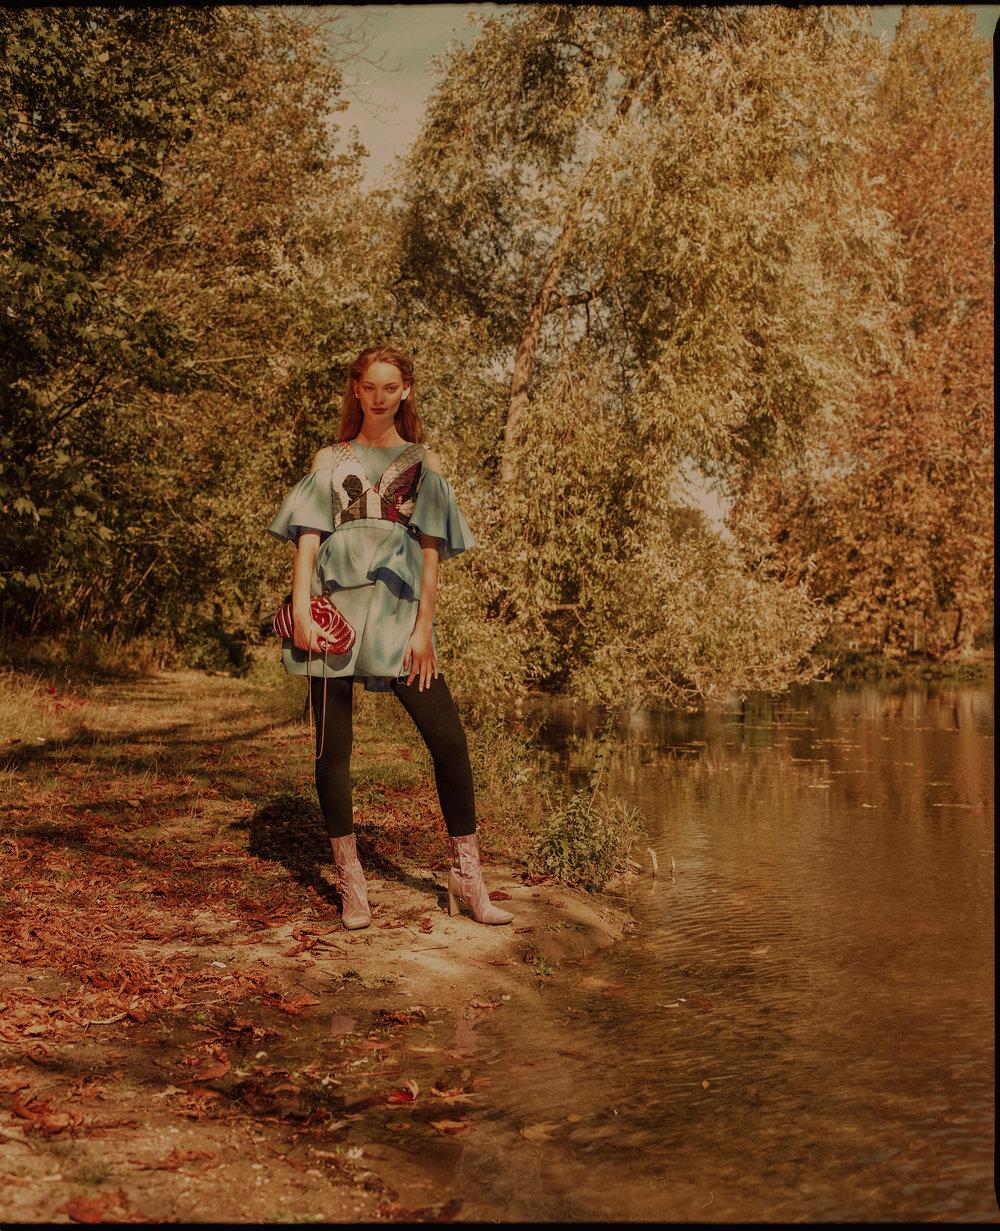 Silk dress - Dice Kayek, Silk bra - Emilio Pucci, Leather bag - Mulberry, Cotton socks - Léo, Fabric boots - Marine Serre.